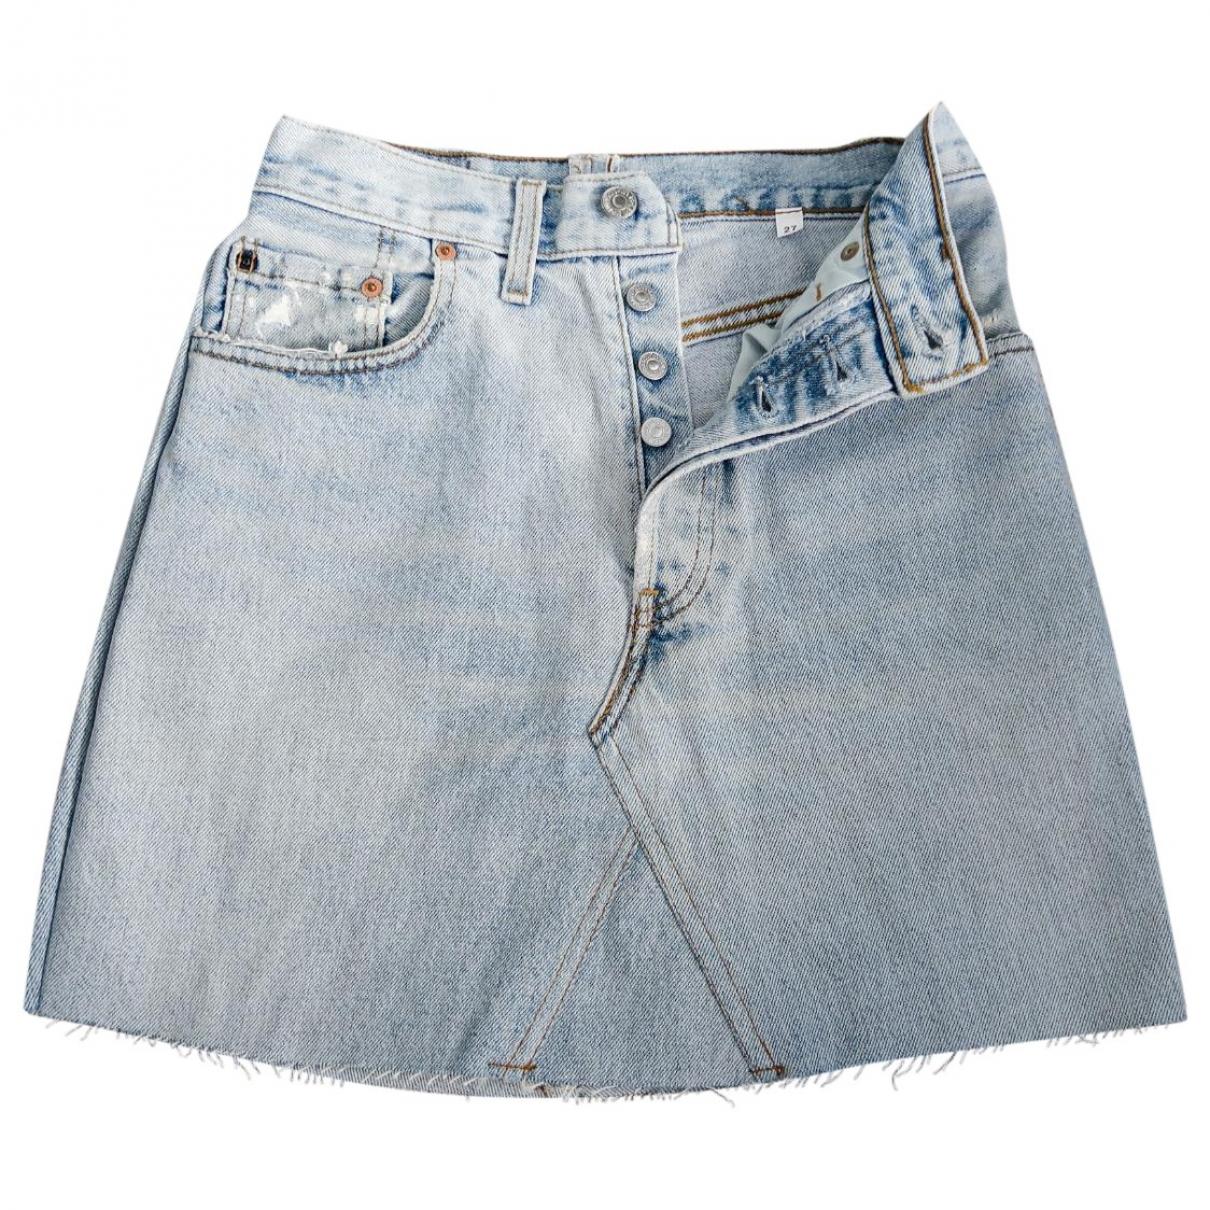 Levi's Vintage Clothing \N Blue Cotton skirt for Women 34 FR